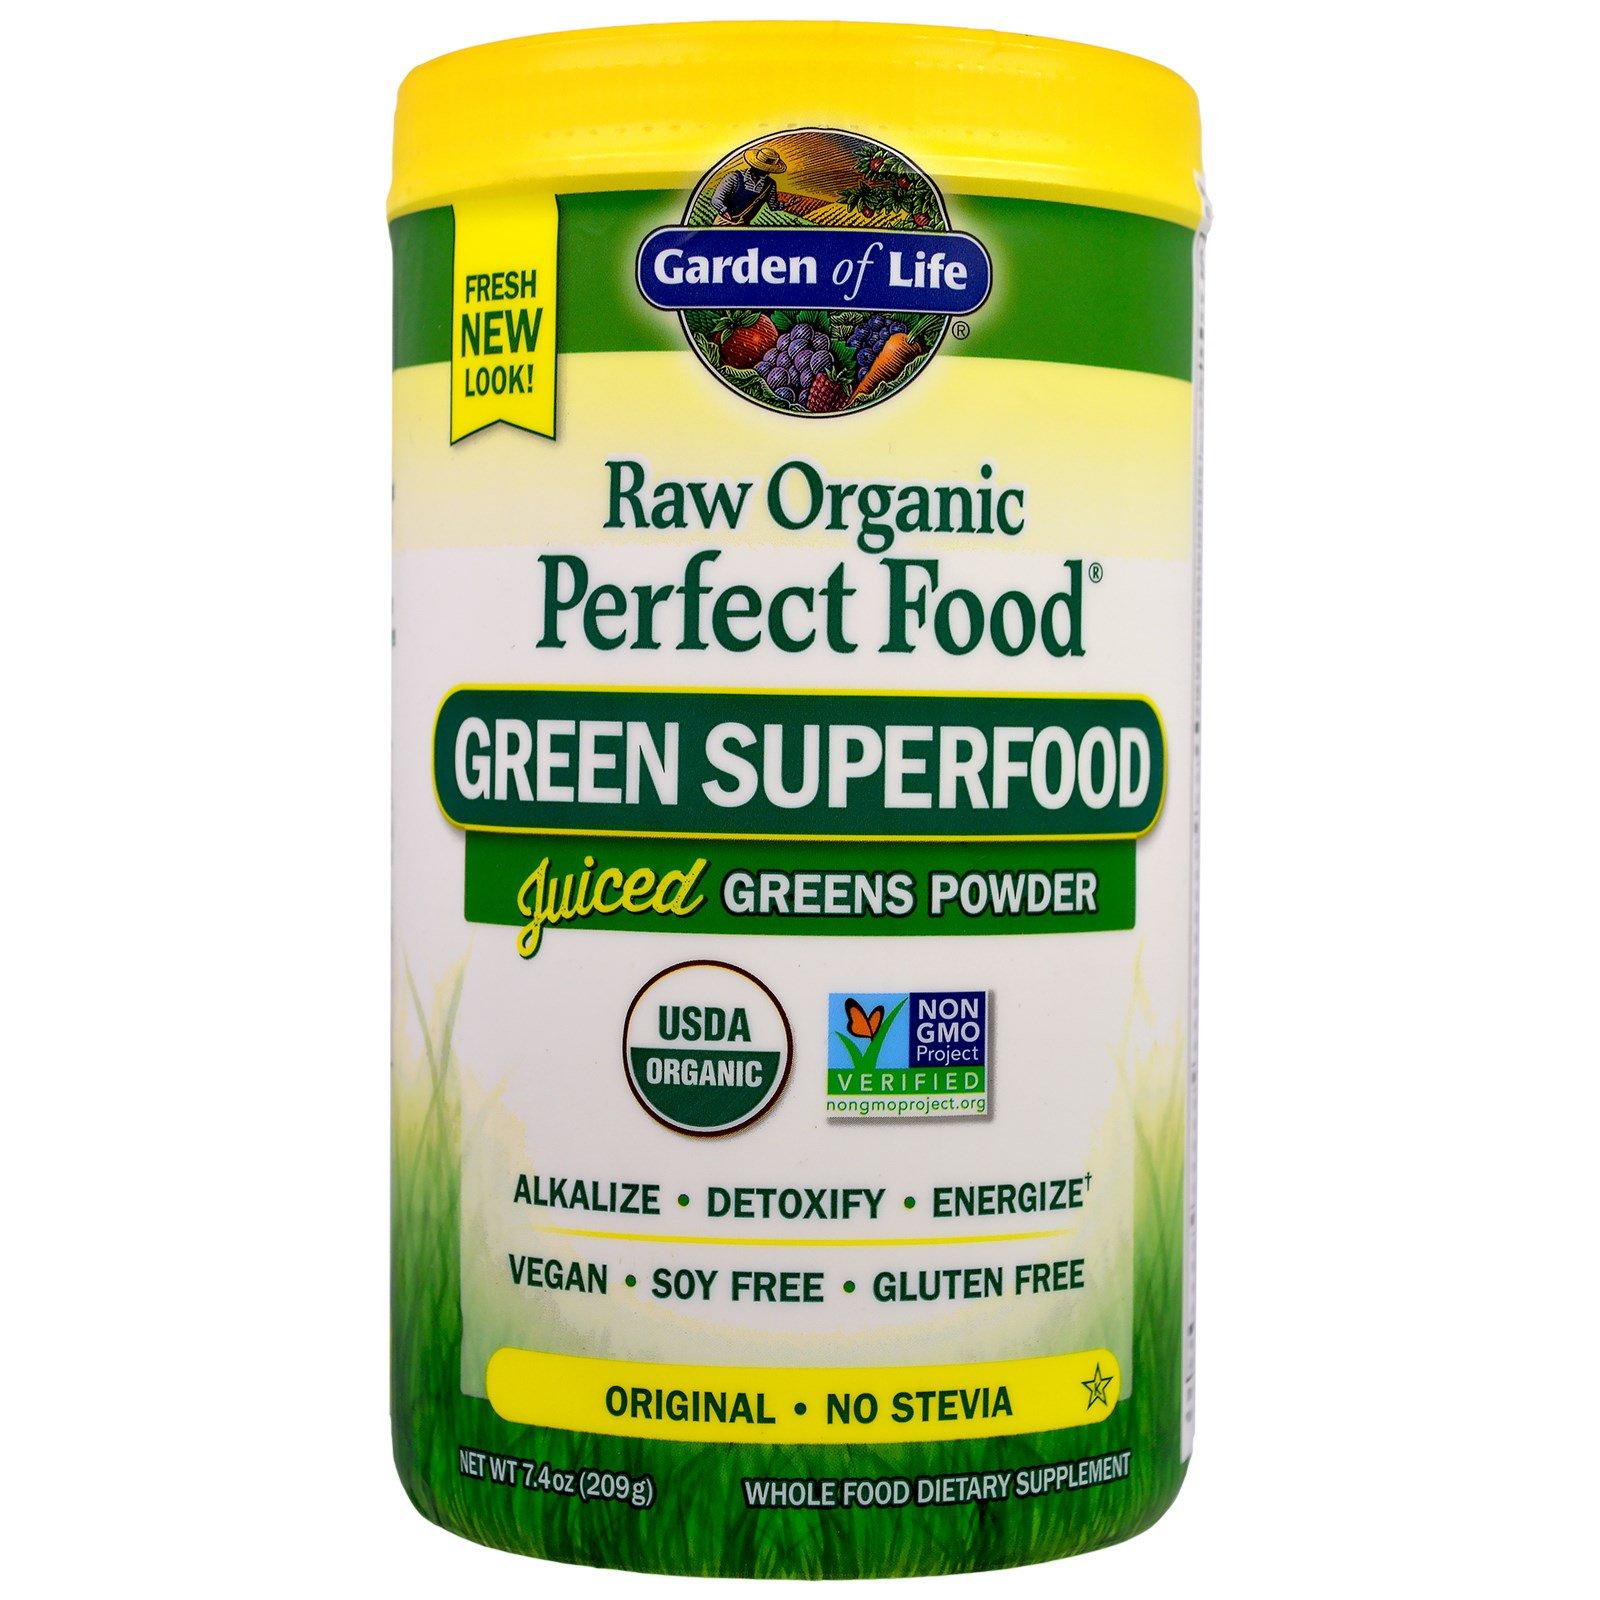 Garden Of Life, Raw Organic Perfect Food, Green Superfood, Original, 7.4 Oz